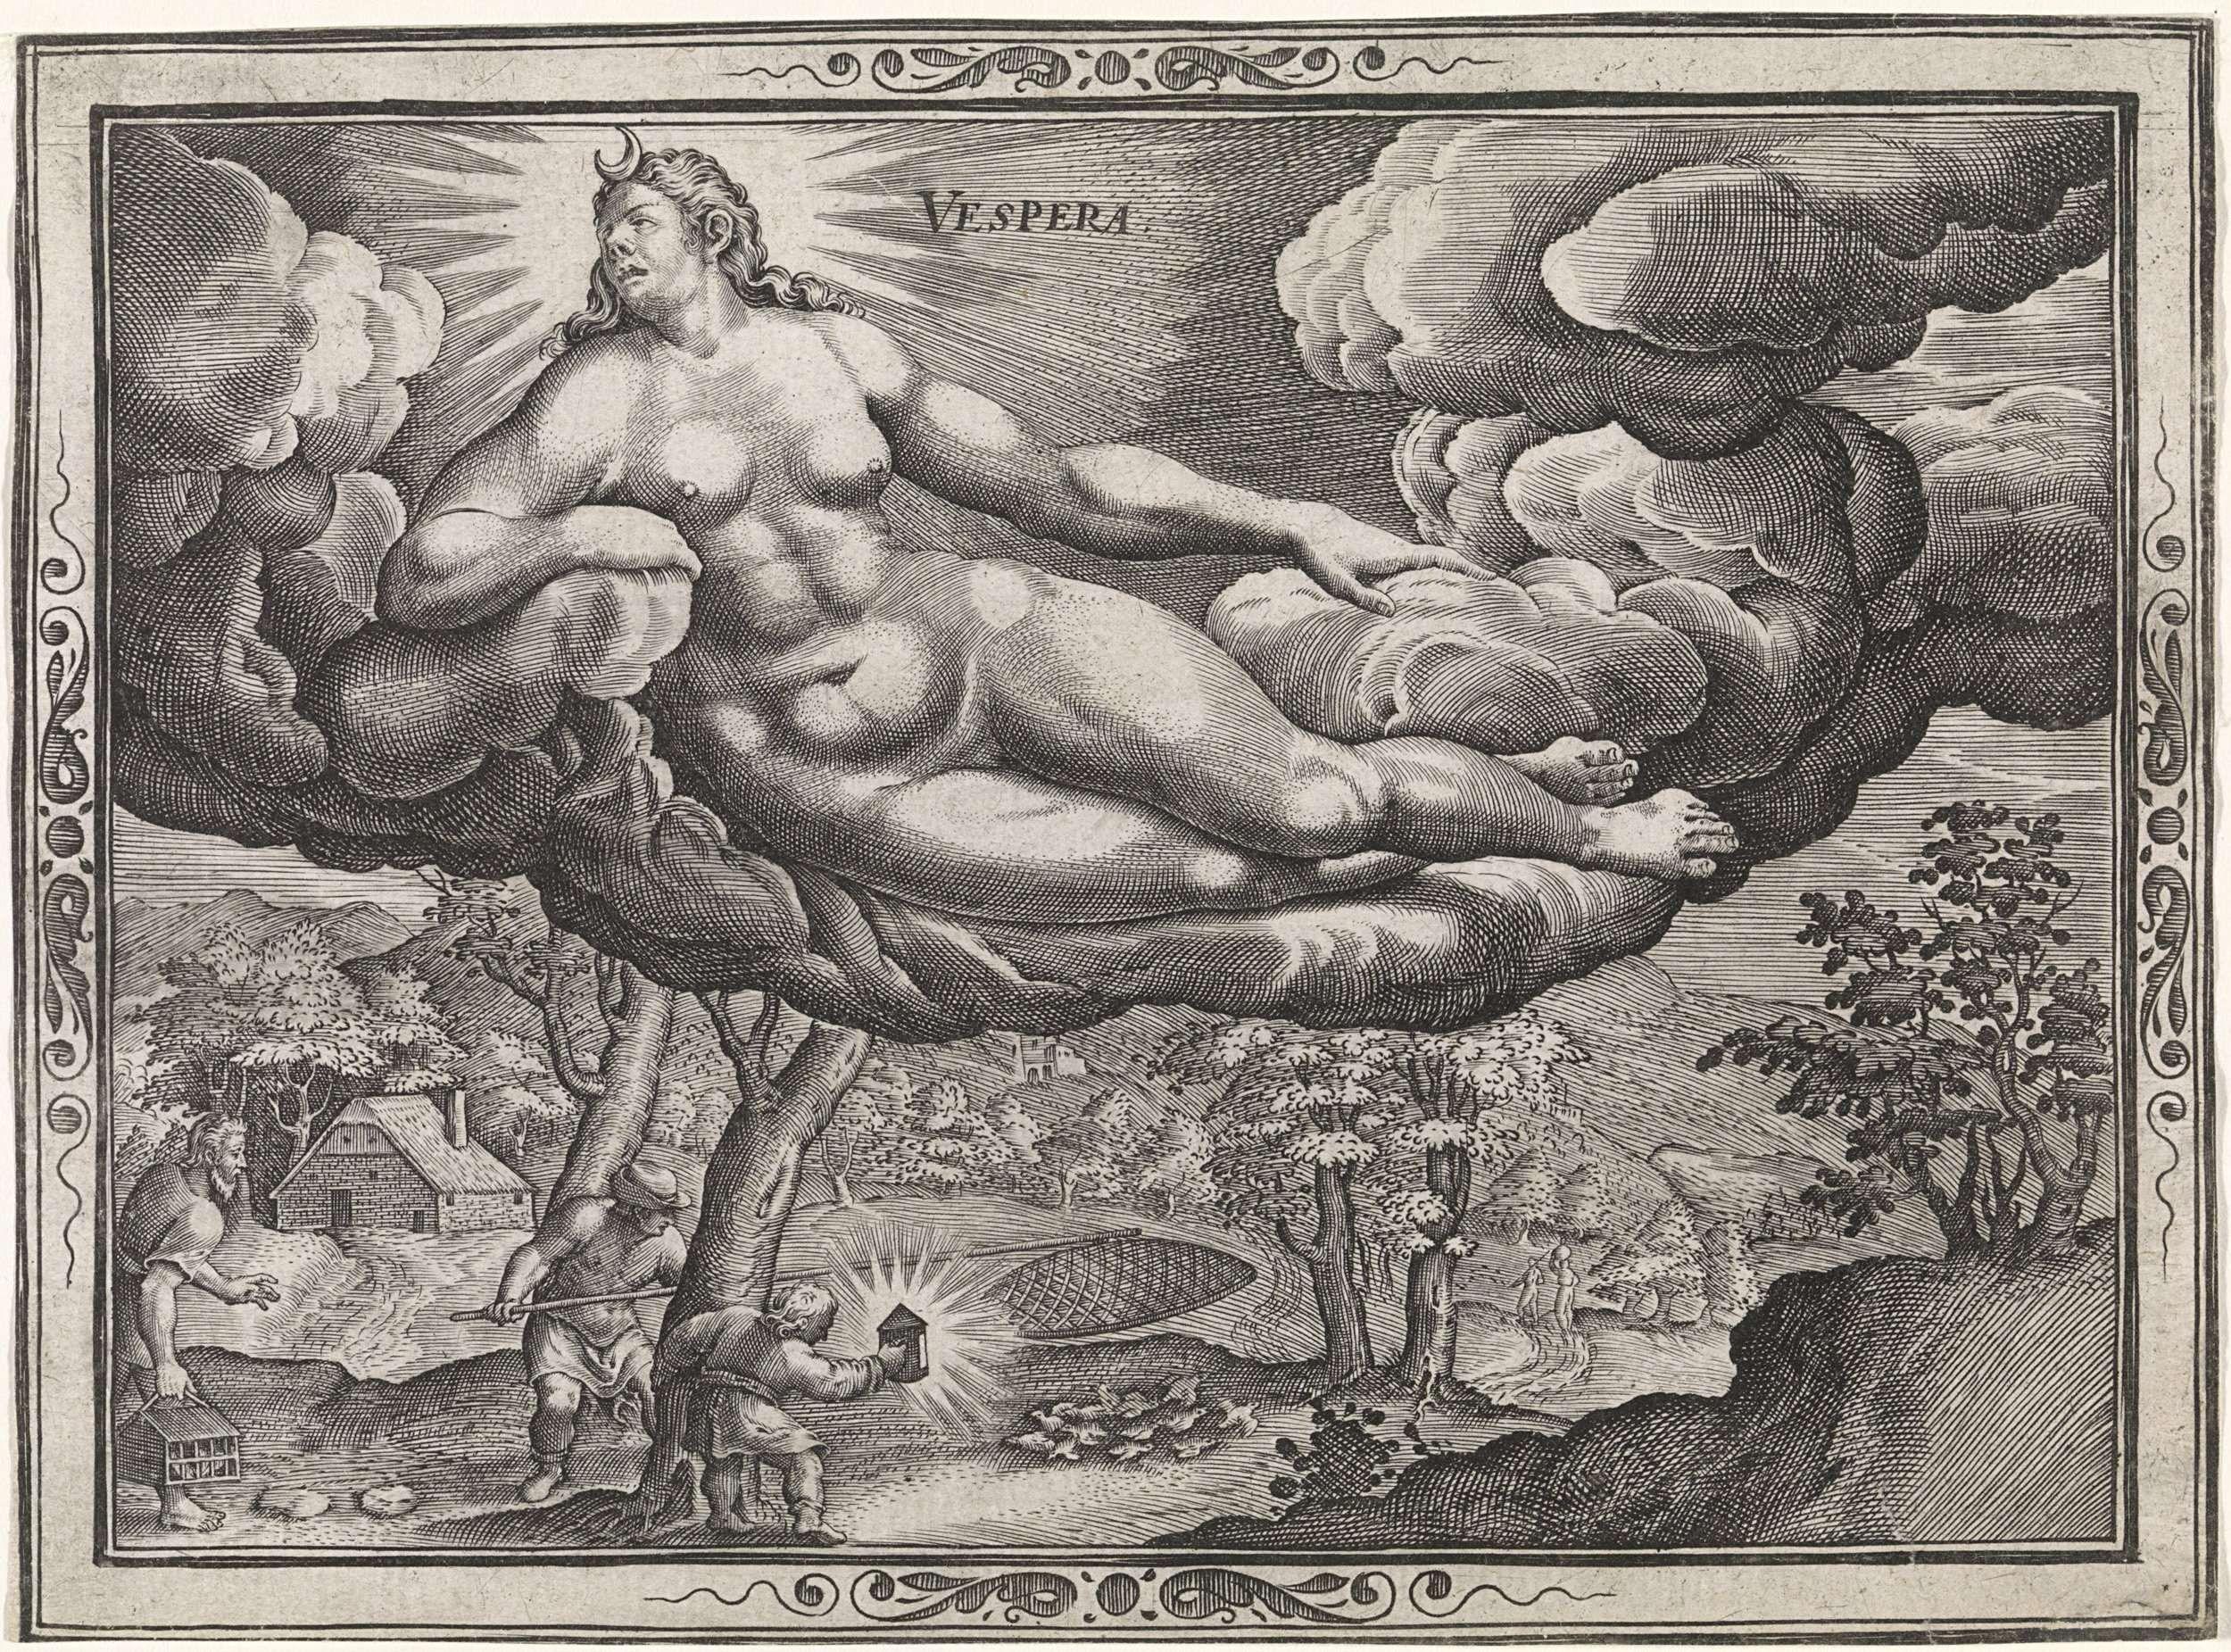 """Vespera"", Anonymous, Johann Sadeler (I), Dirck Barendsz., 1667 - 1736"